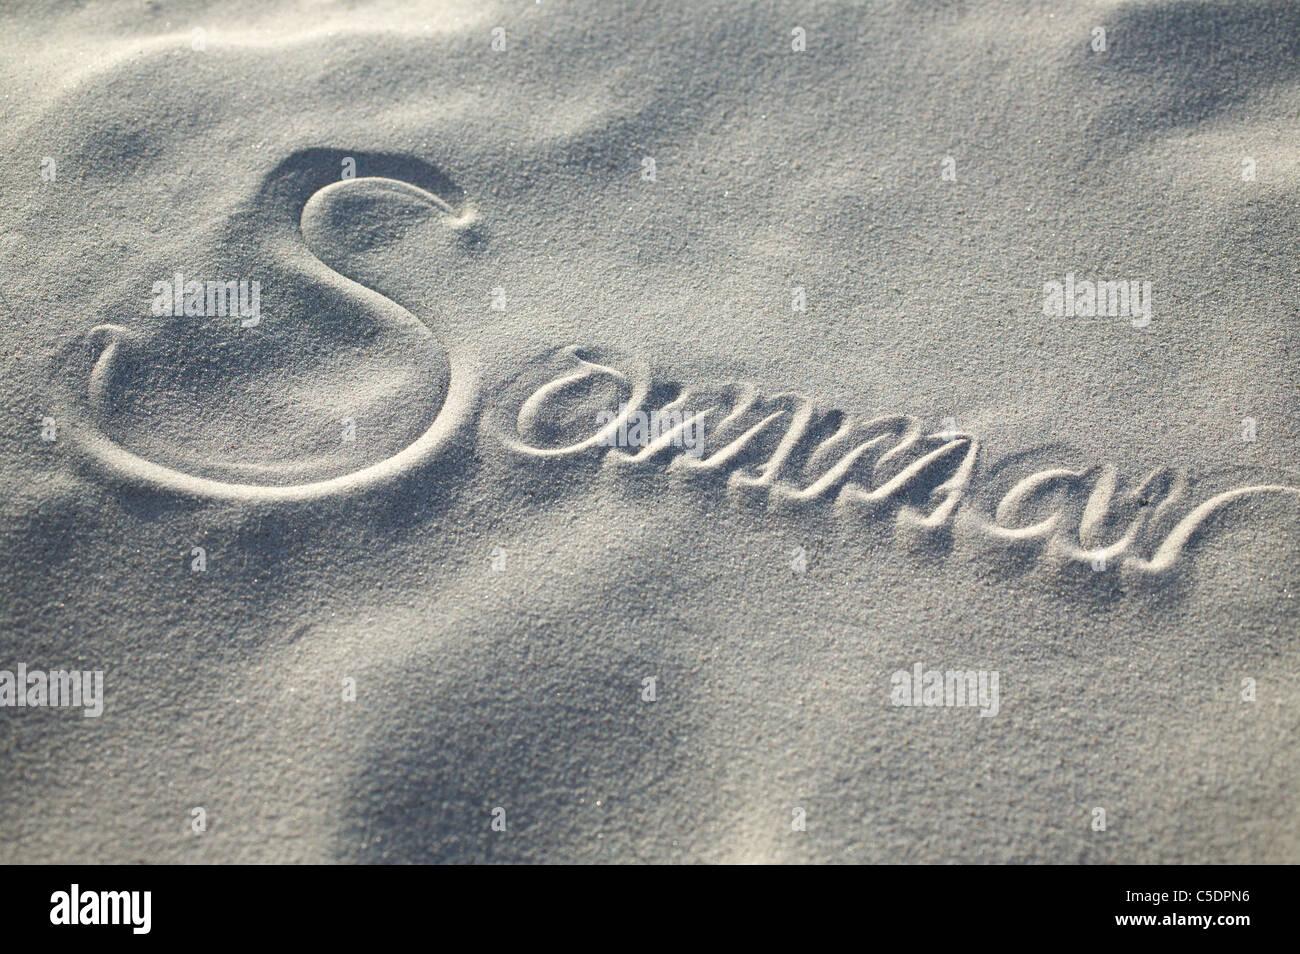 Close-up of summer written on sandy beach - Stock Image